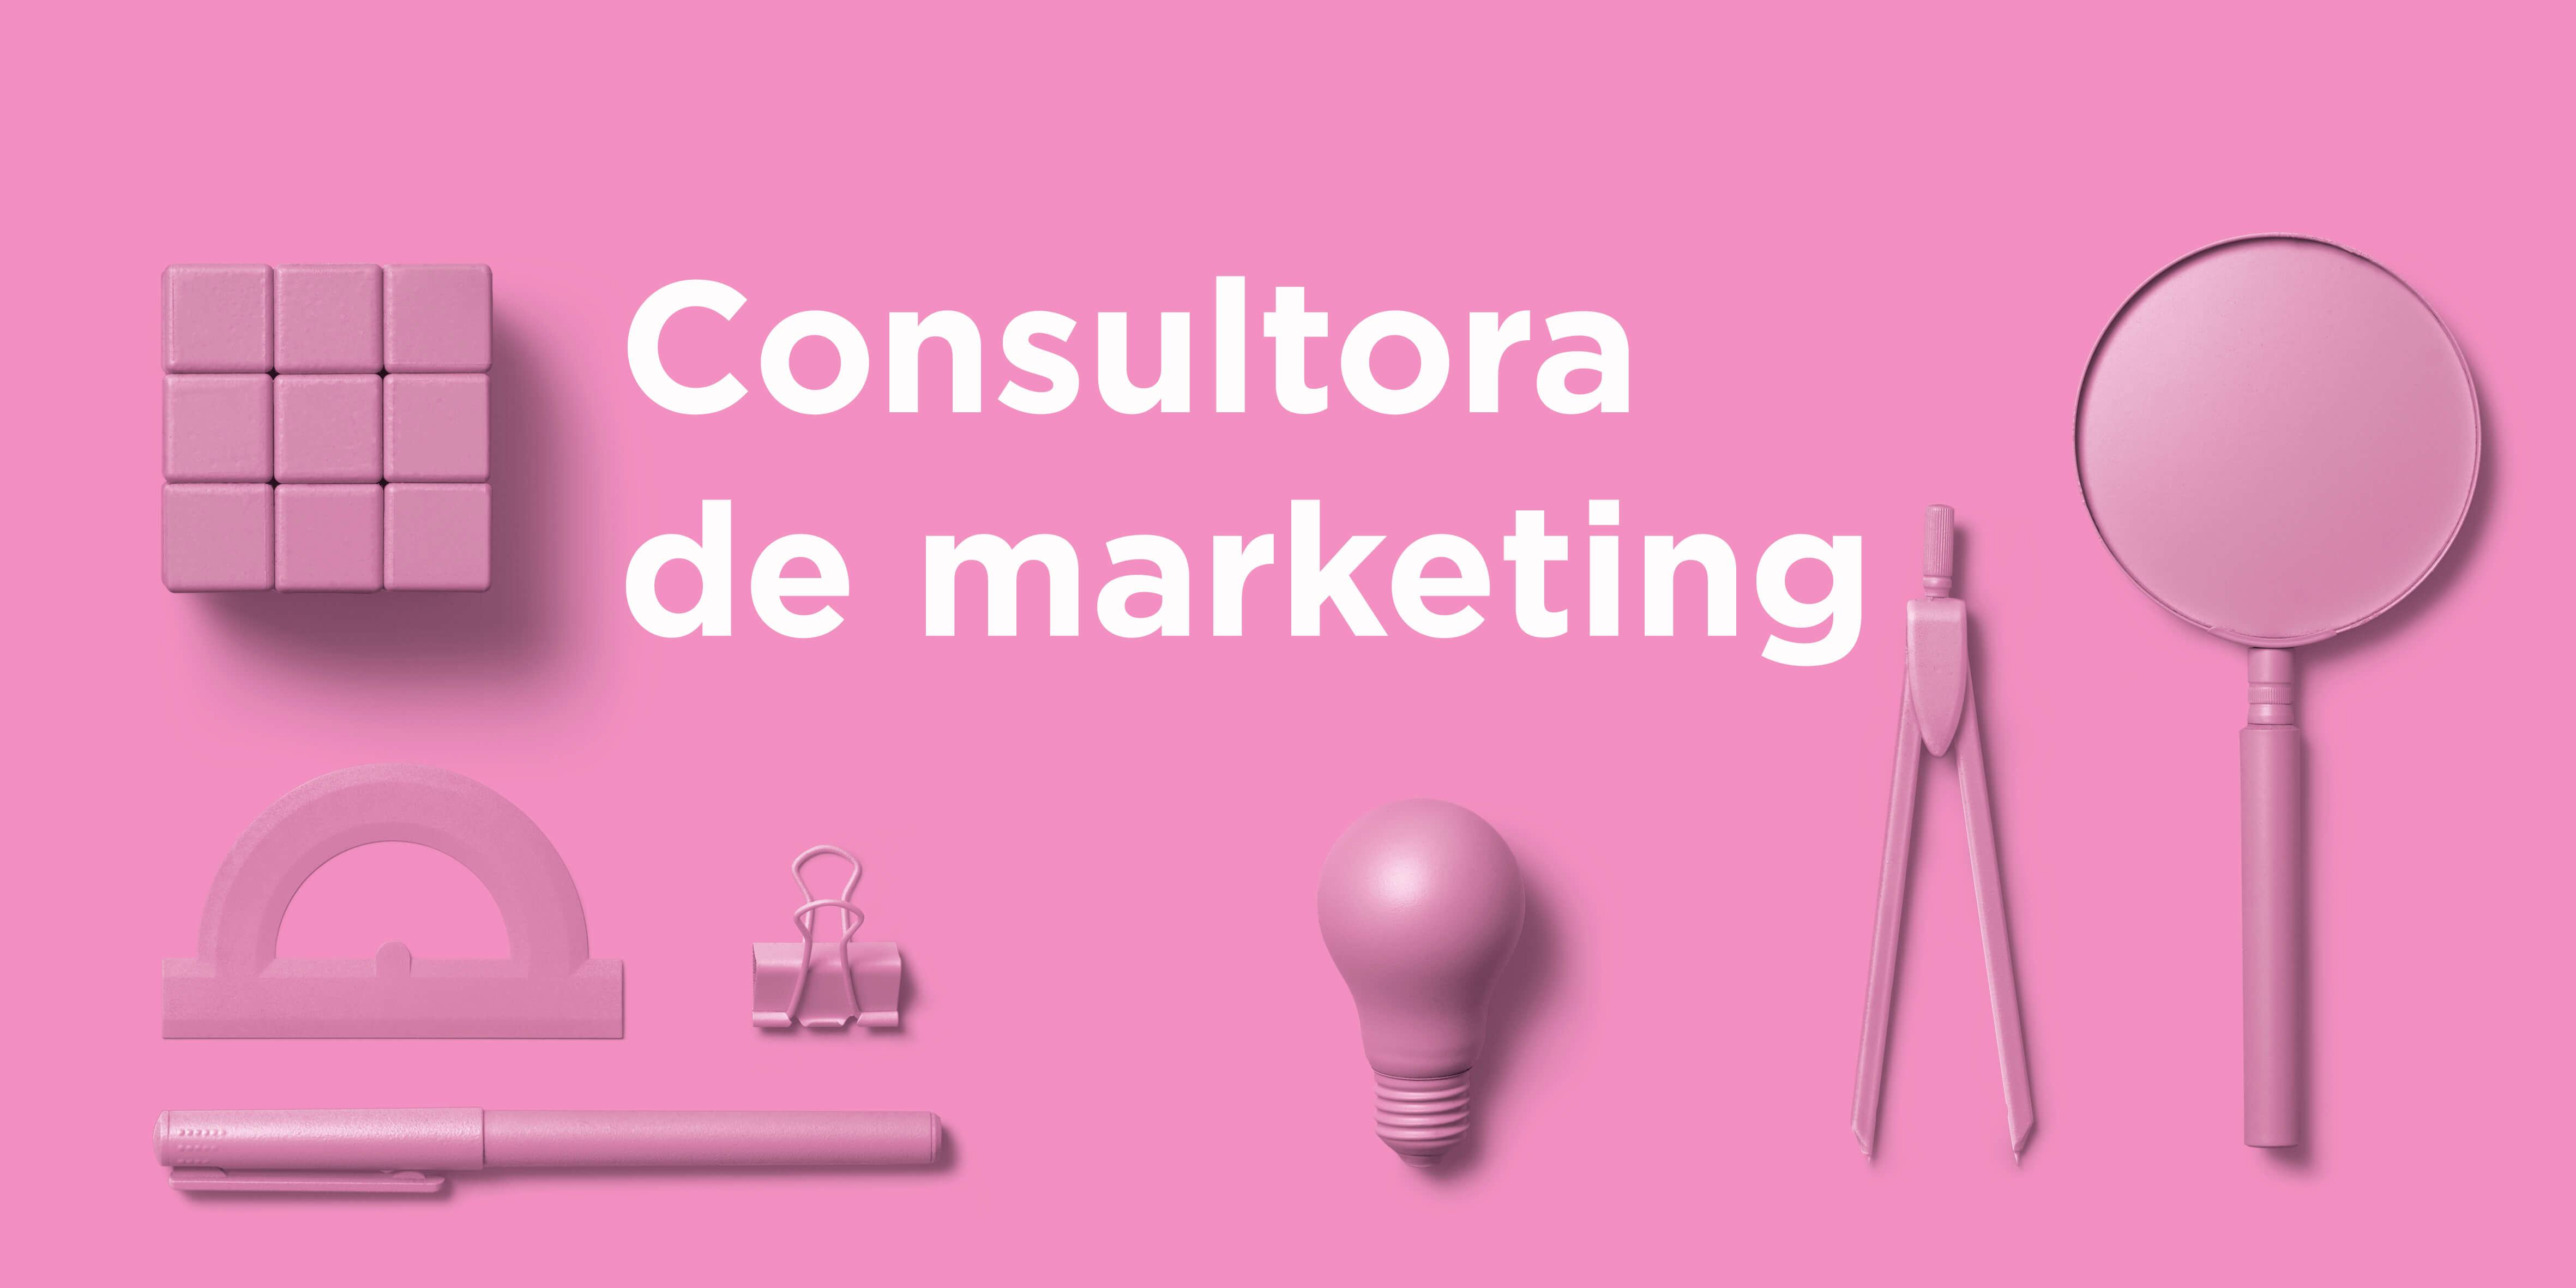 Consultora de marketing tiny